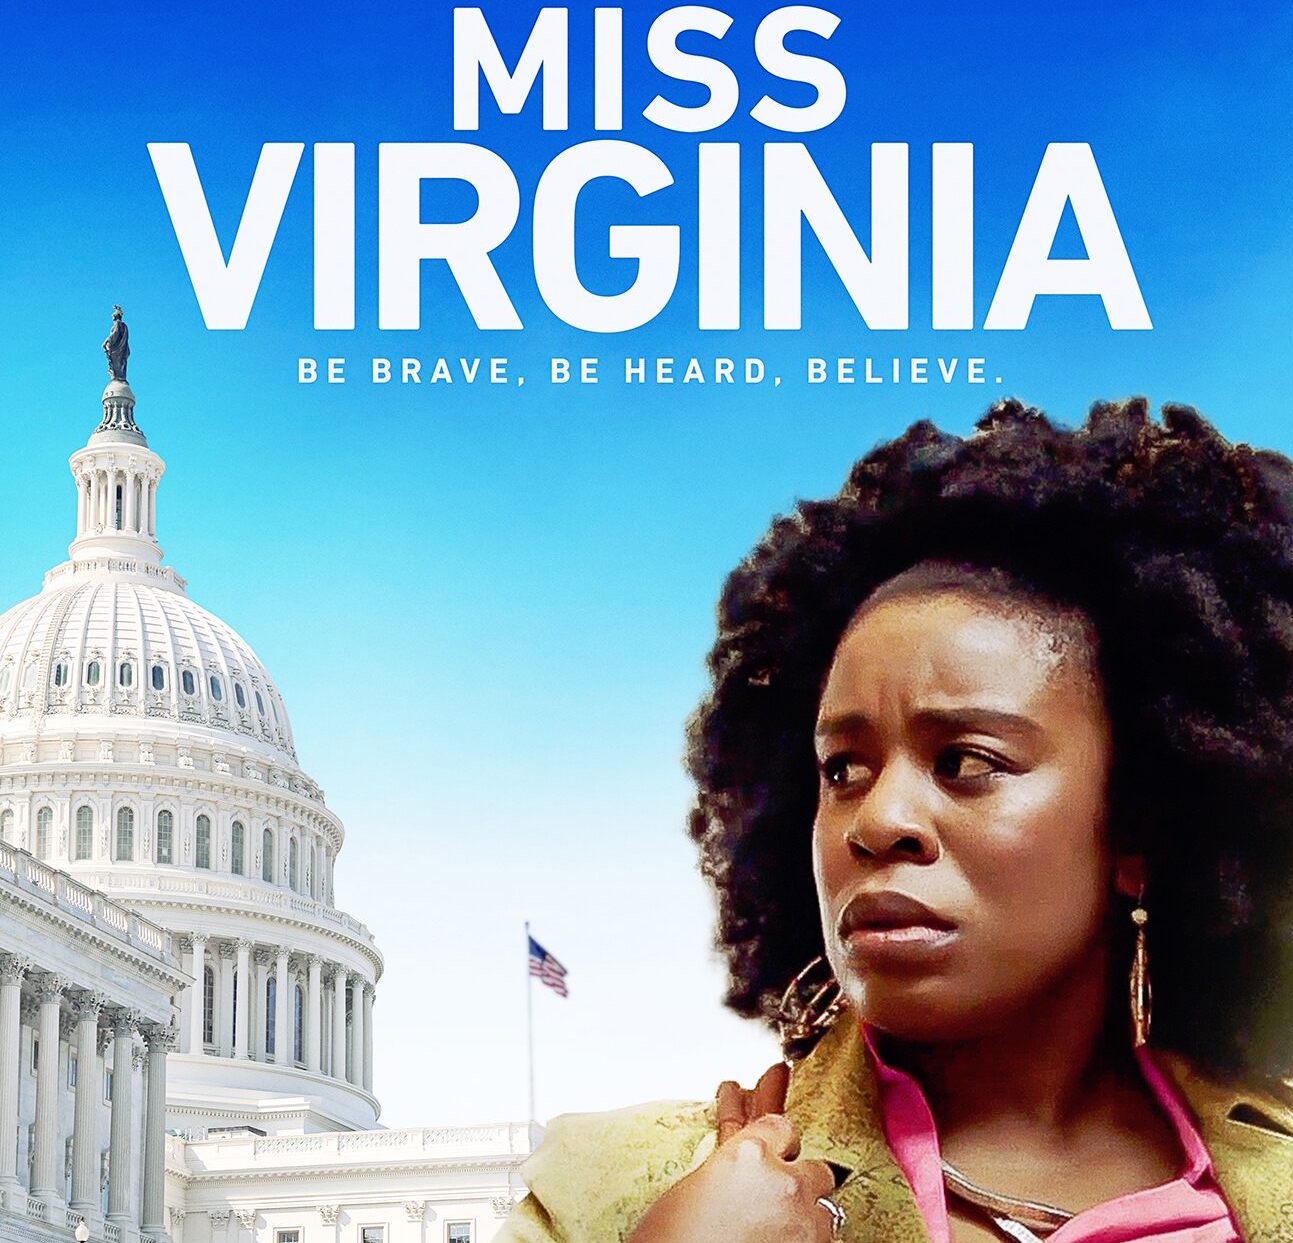 miss-virginia-poster-uzo-aduba.jpg